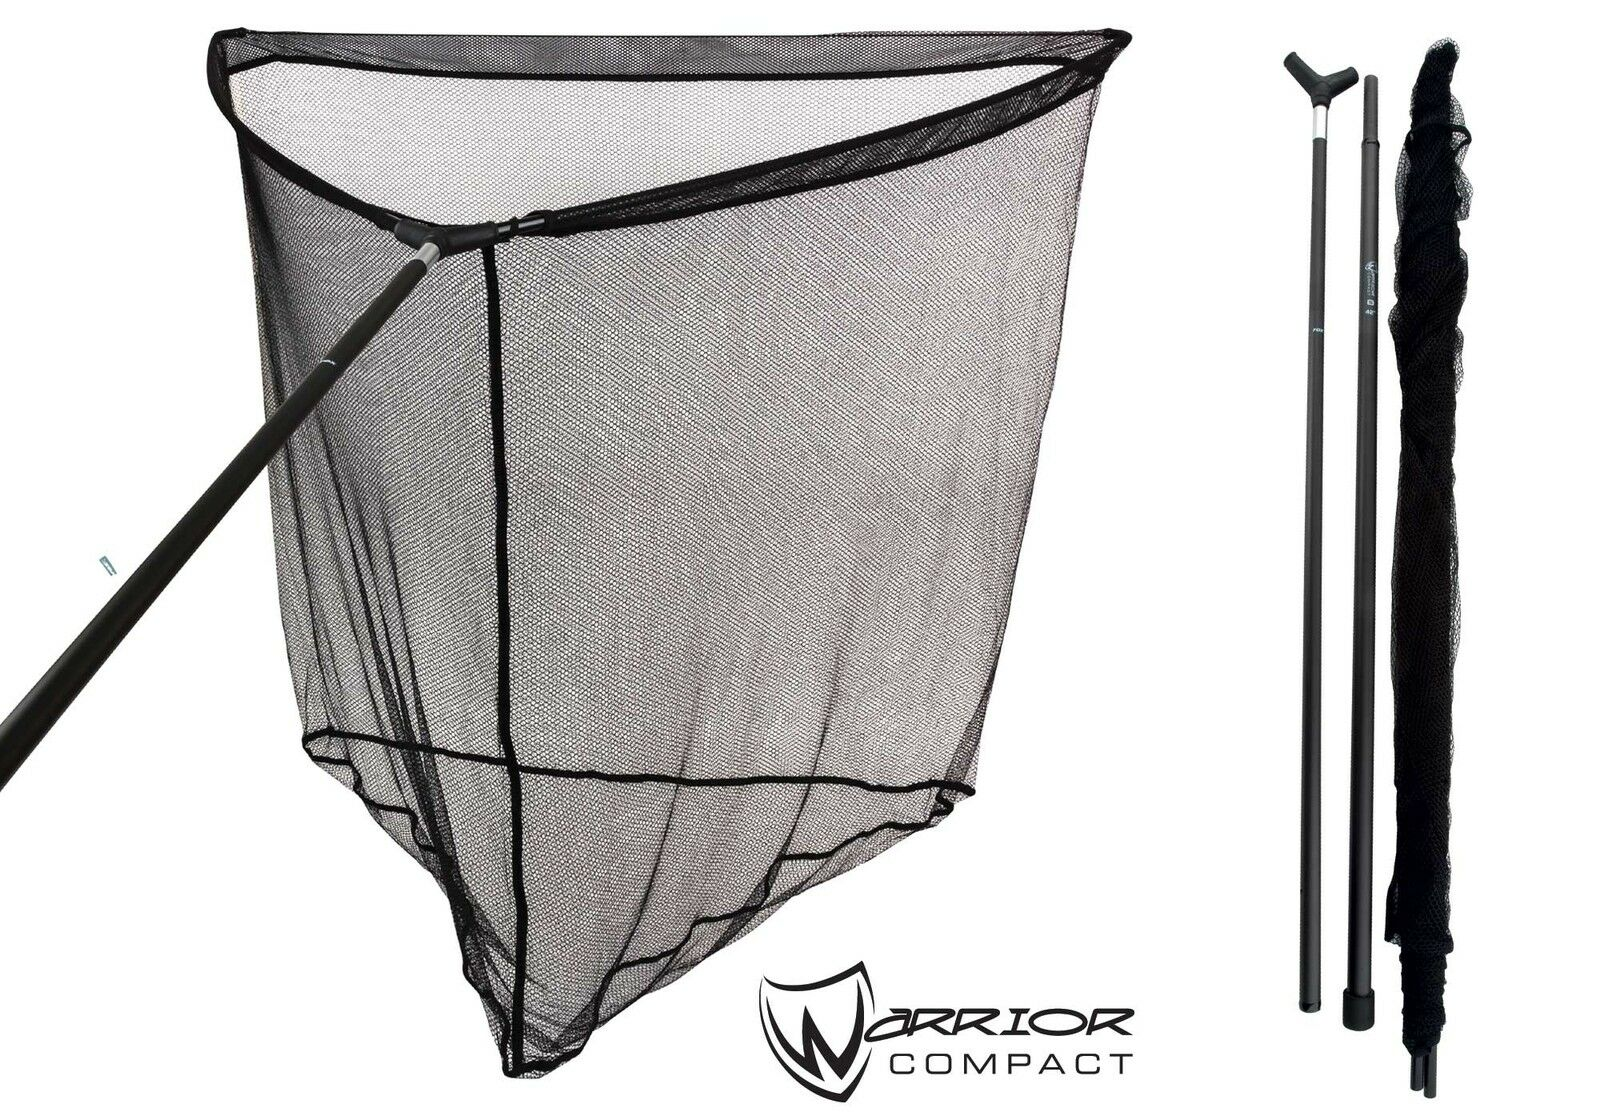 Fox Warrior S Compact Landing Net 42in   Fishing   CLN029